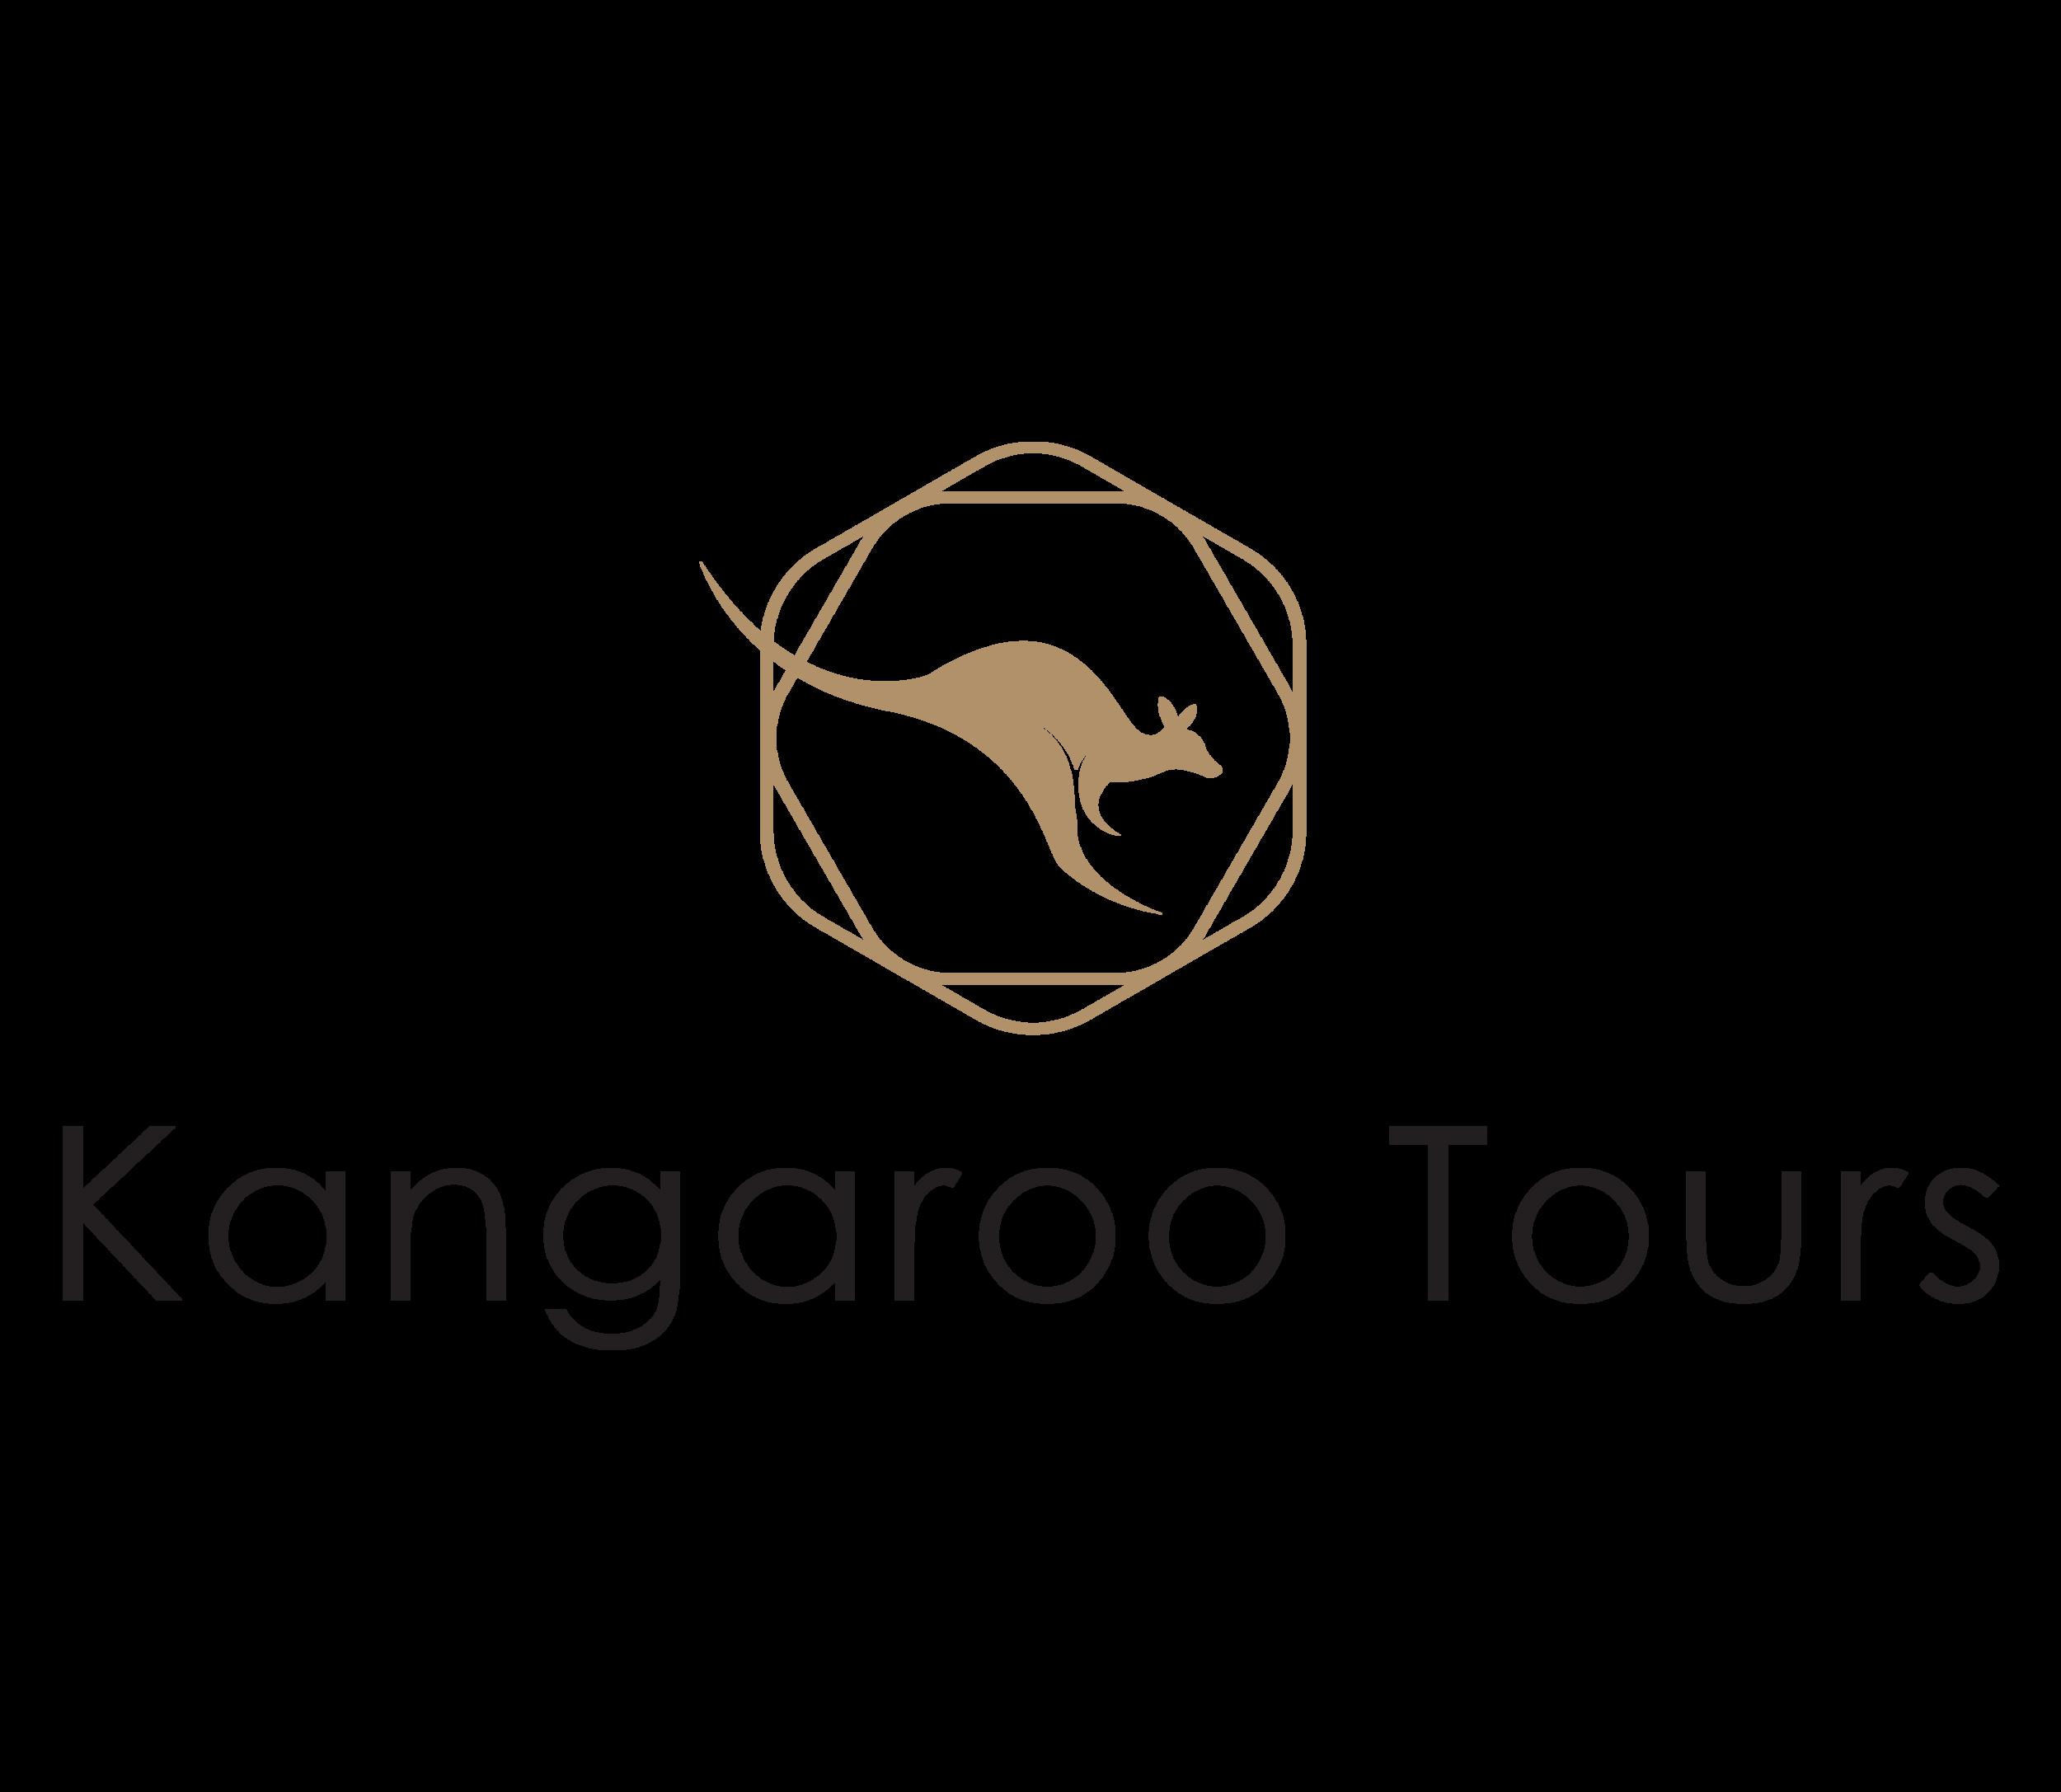 kagaroo tours.png